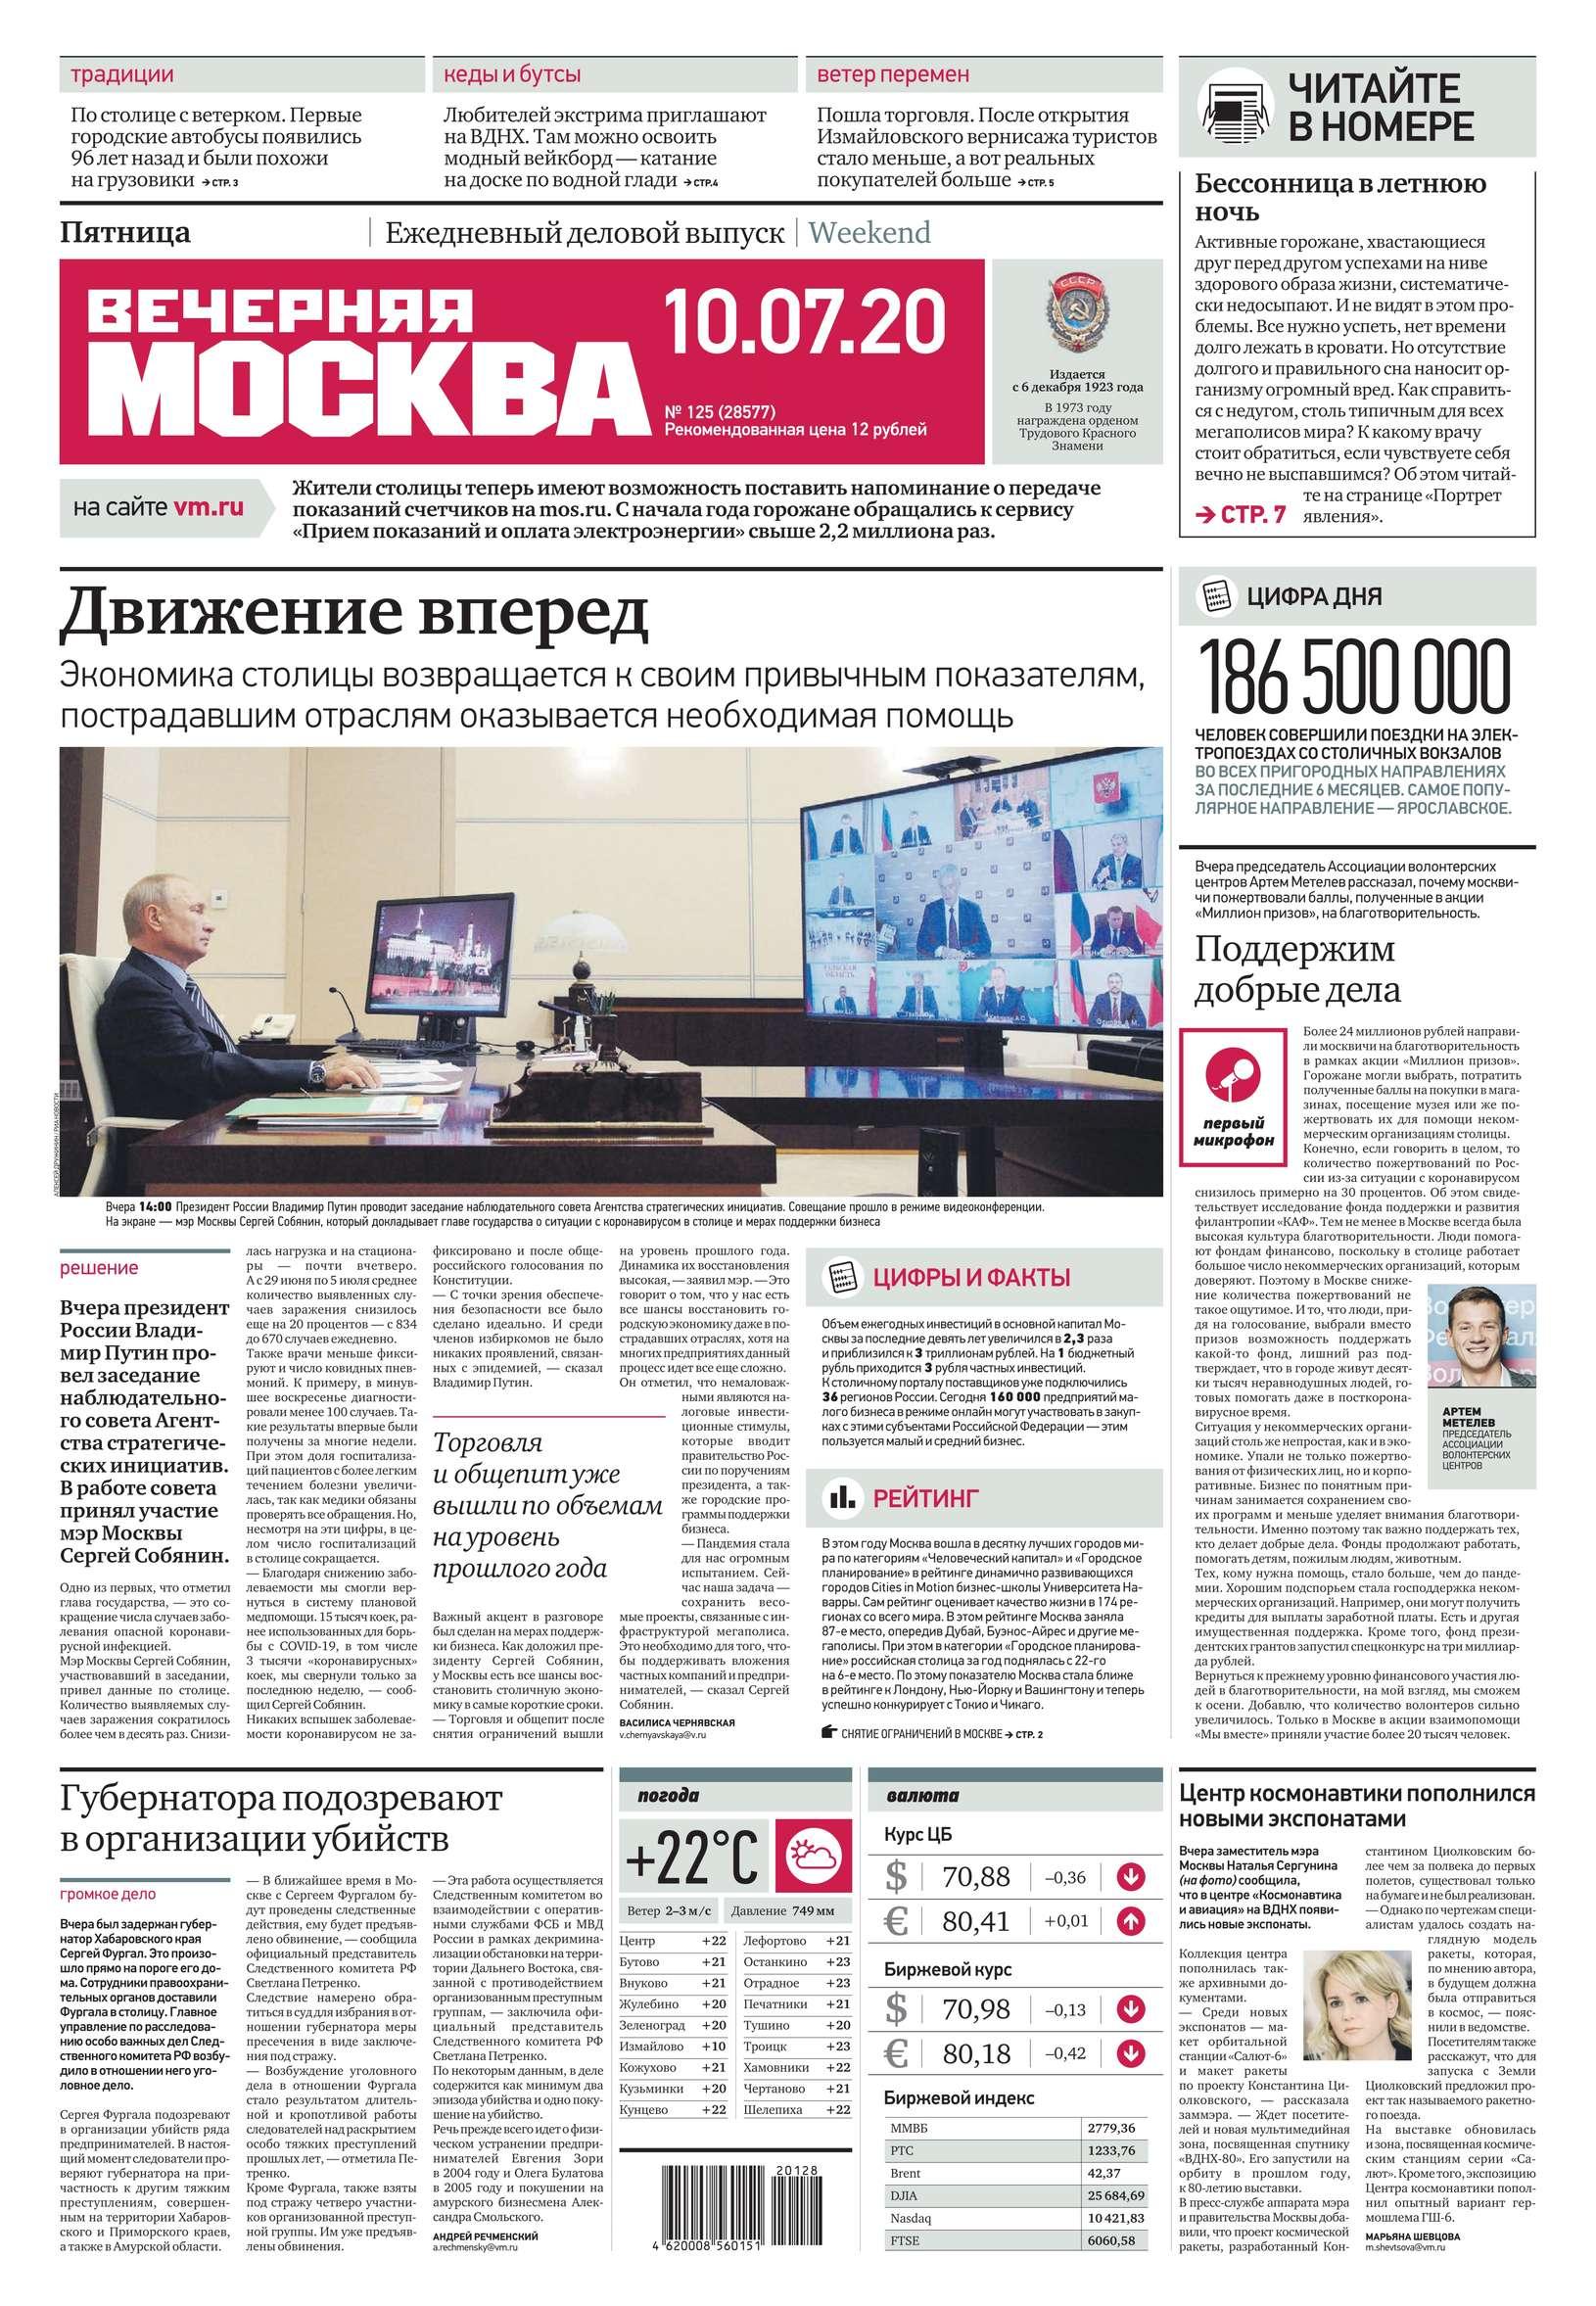 Редакция газеты Вечерняя Москва Вечерняя Москва 125-2020